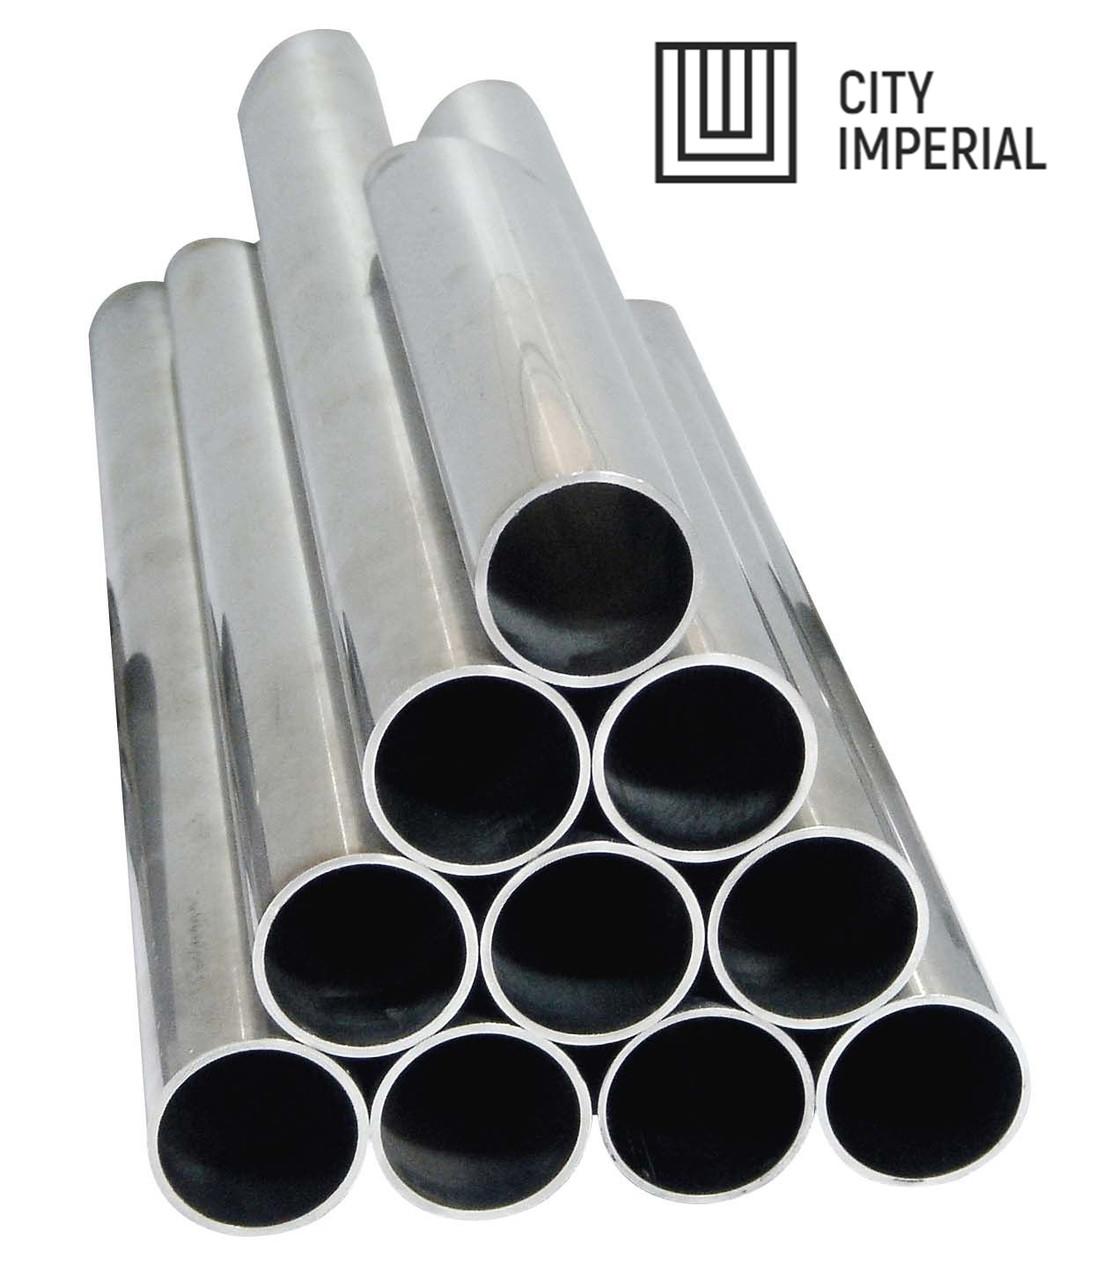 Трубы под сваи 325 мм